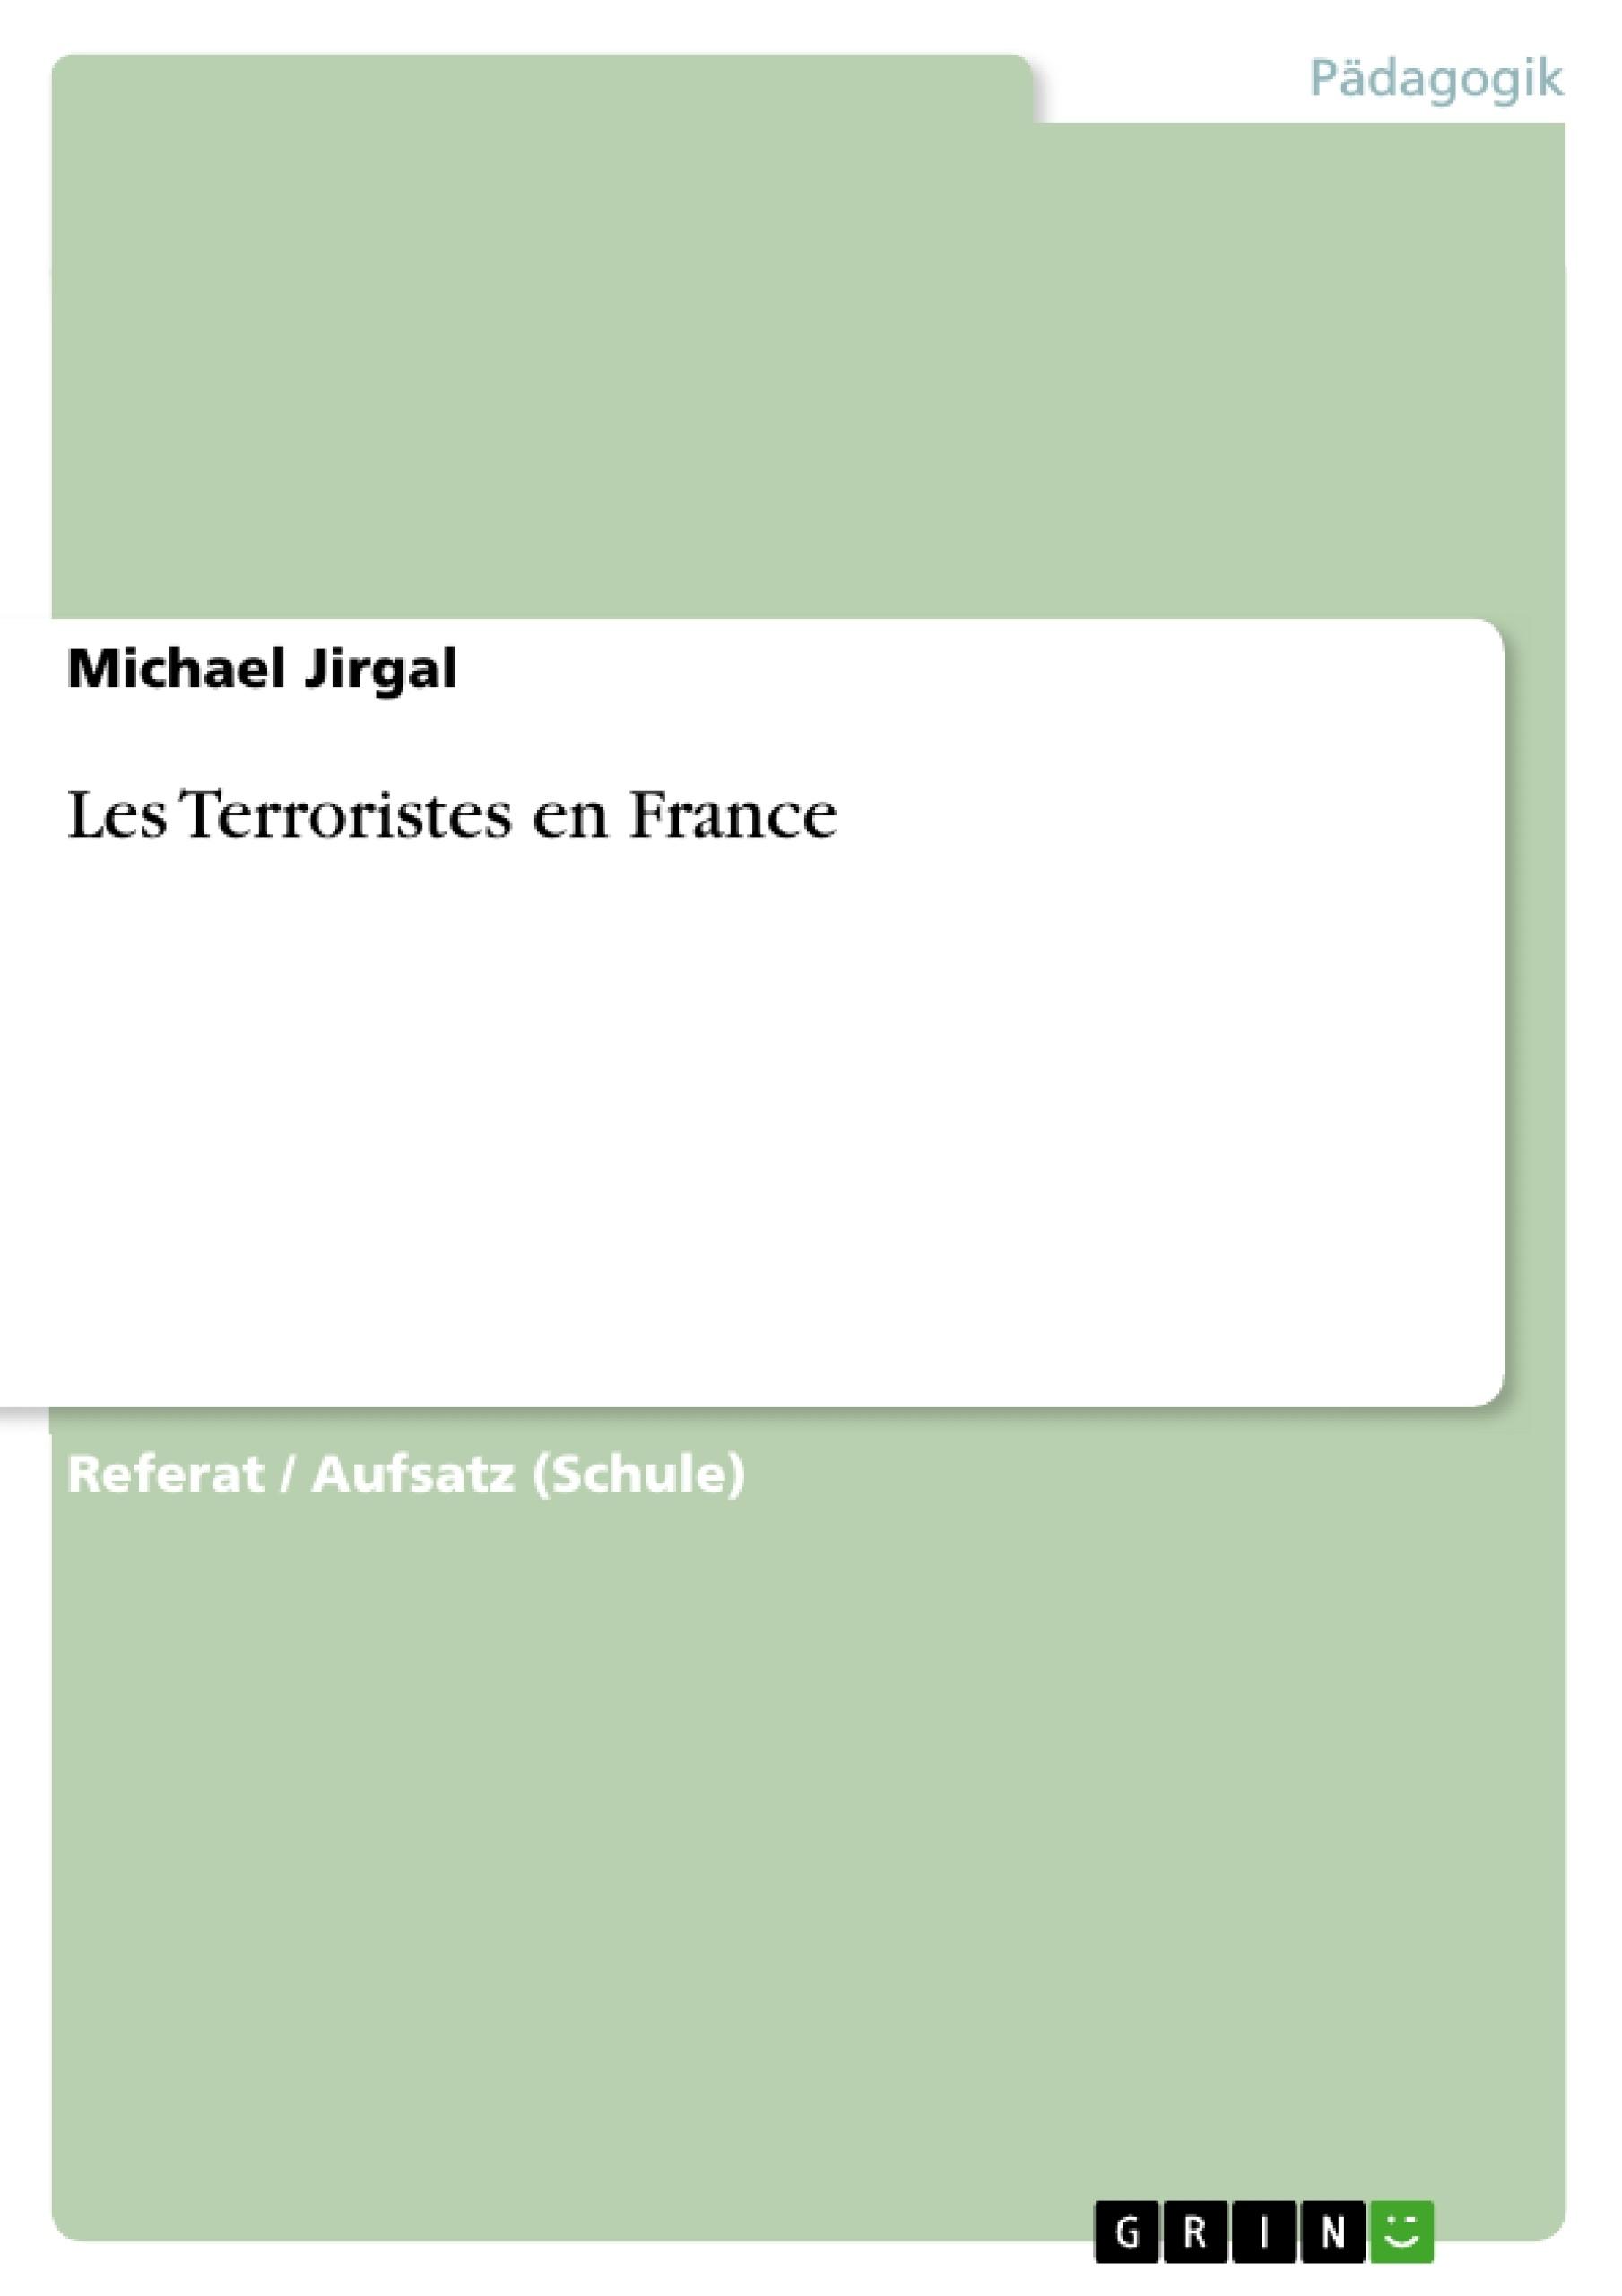 Titel: Les Terroristes en France